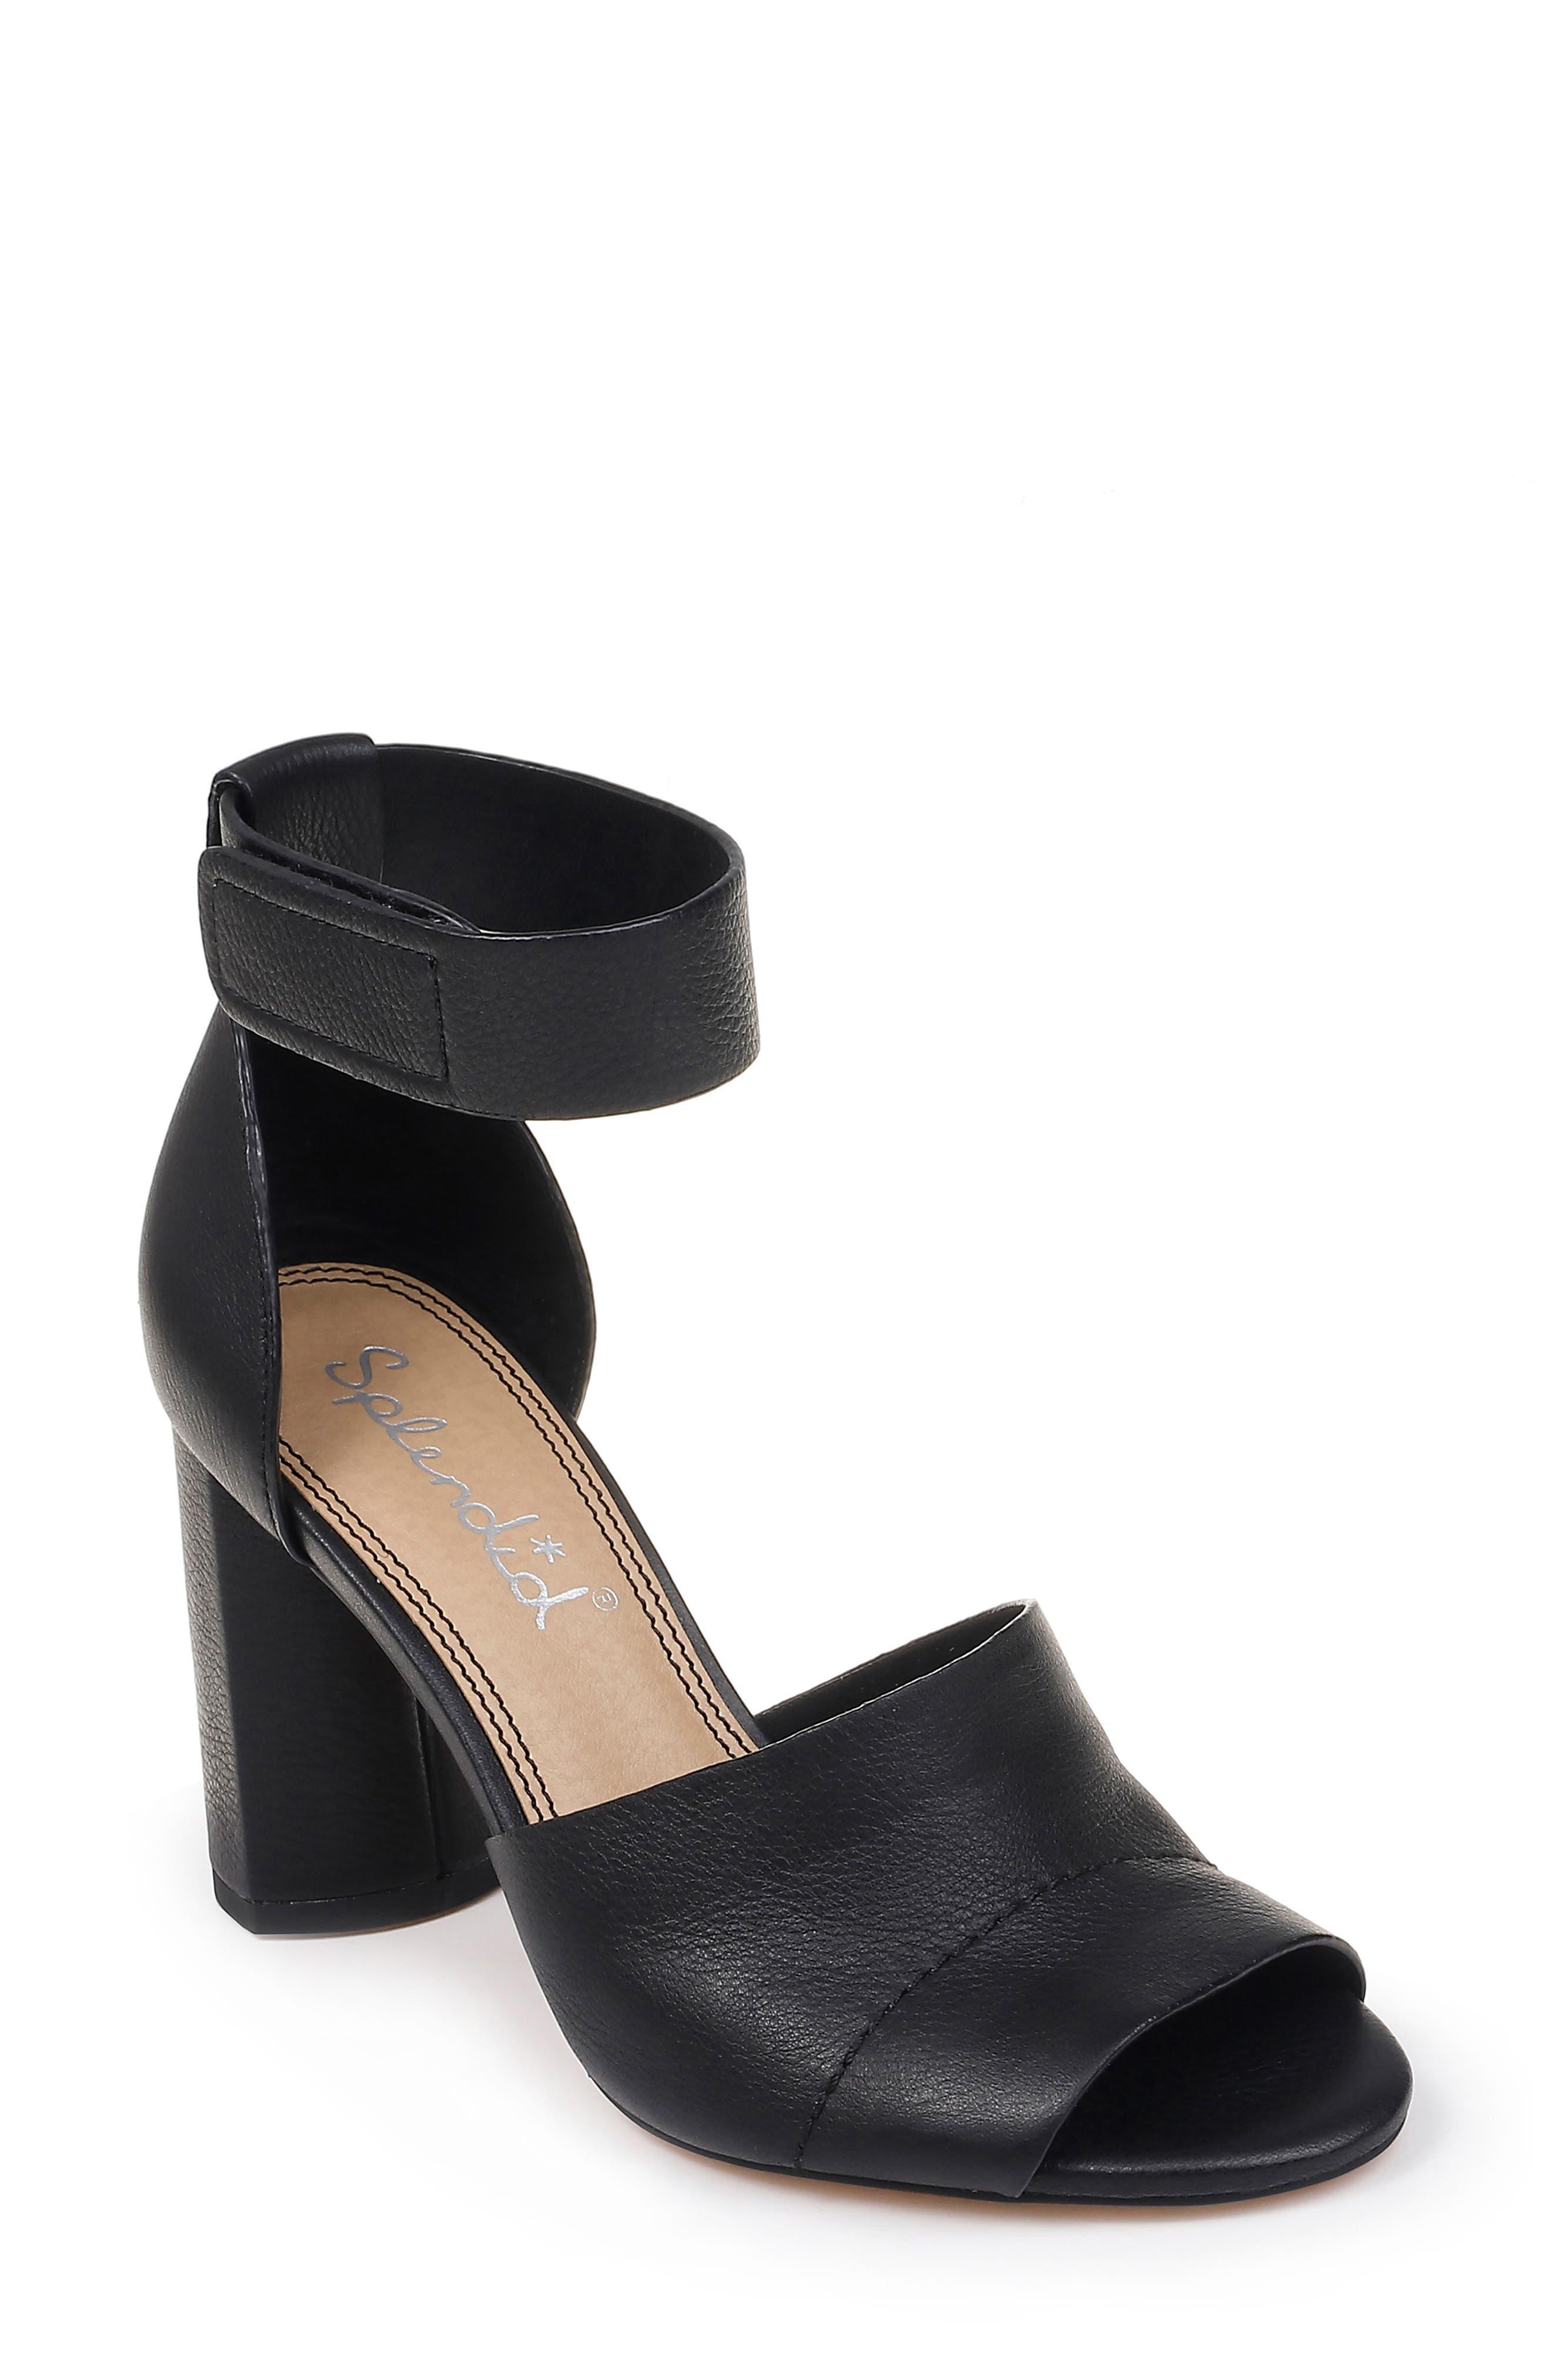 SPLENDID, Thandie Ankle Strap Sandal, Main thumbnail 1, color, BLACK NUBUCK LEATHER